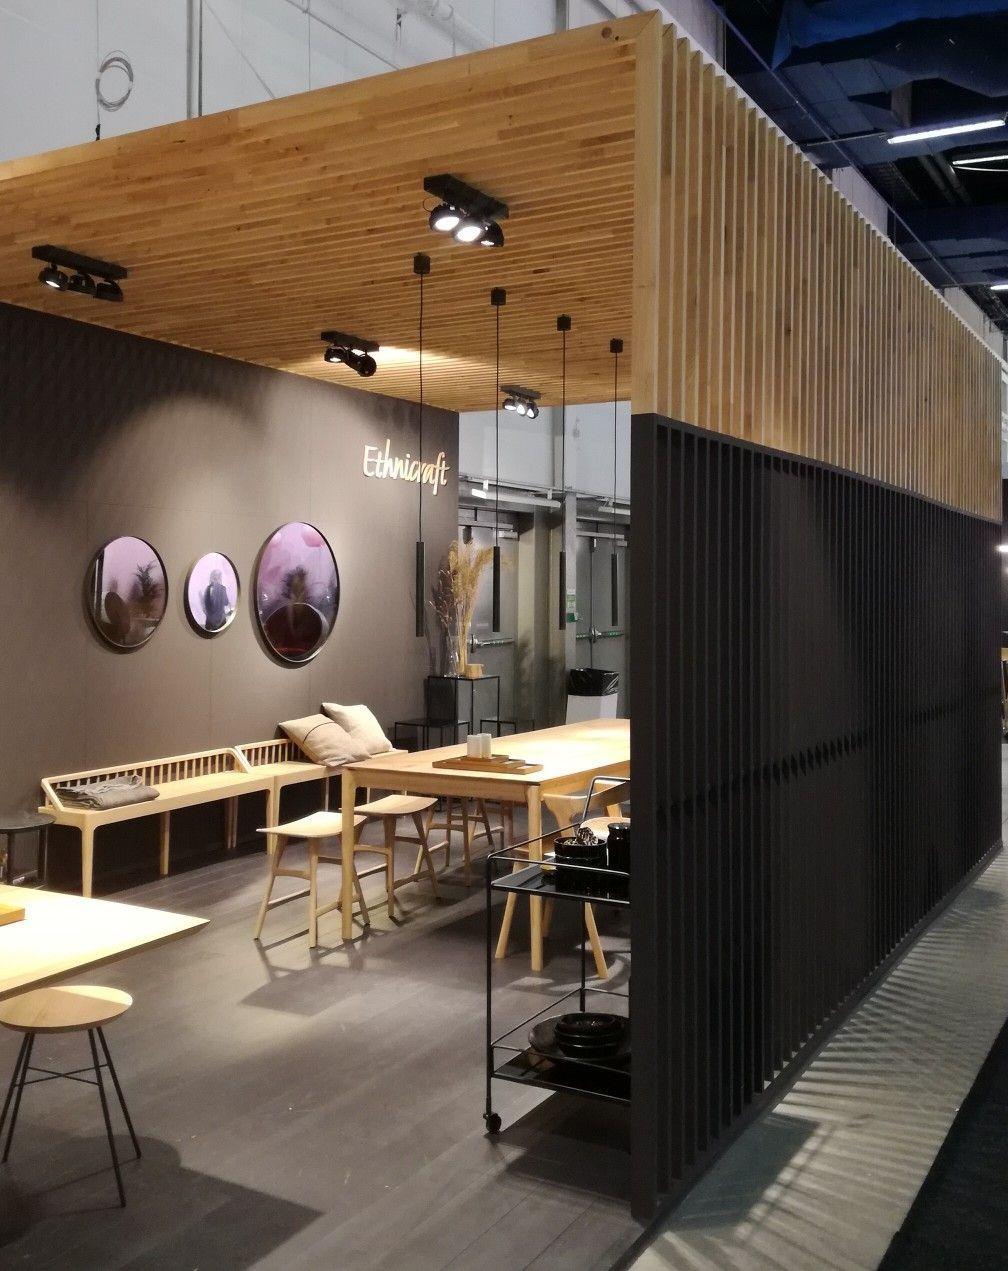 Furnituredesign Scandinavian Furniture Design Office Design Inspiration Office Interior Design